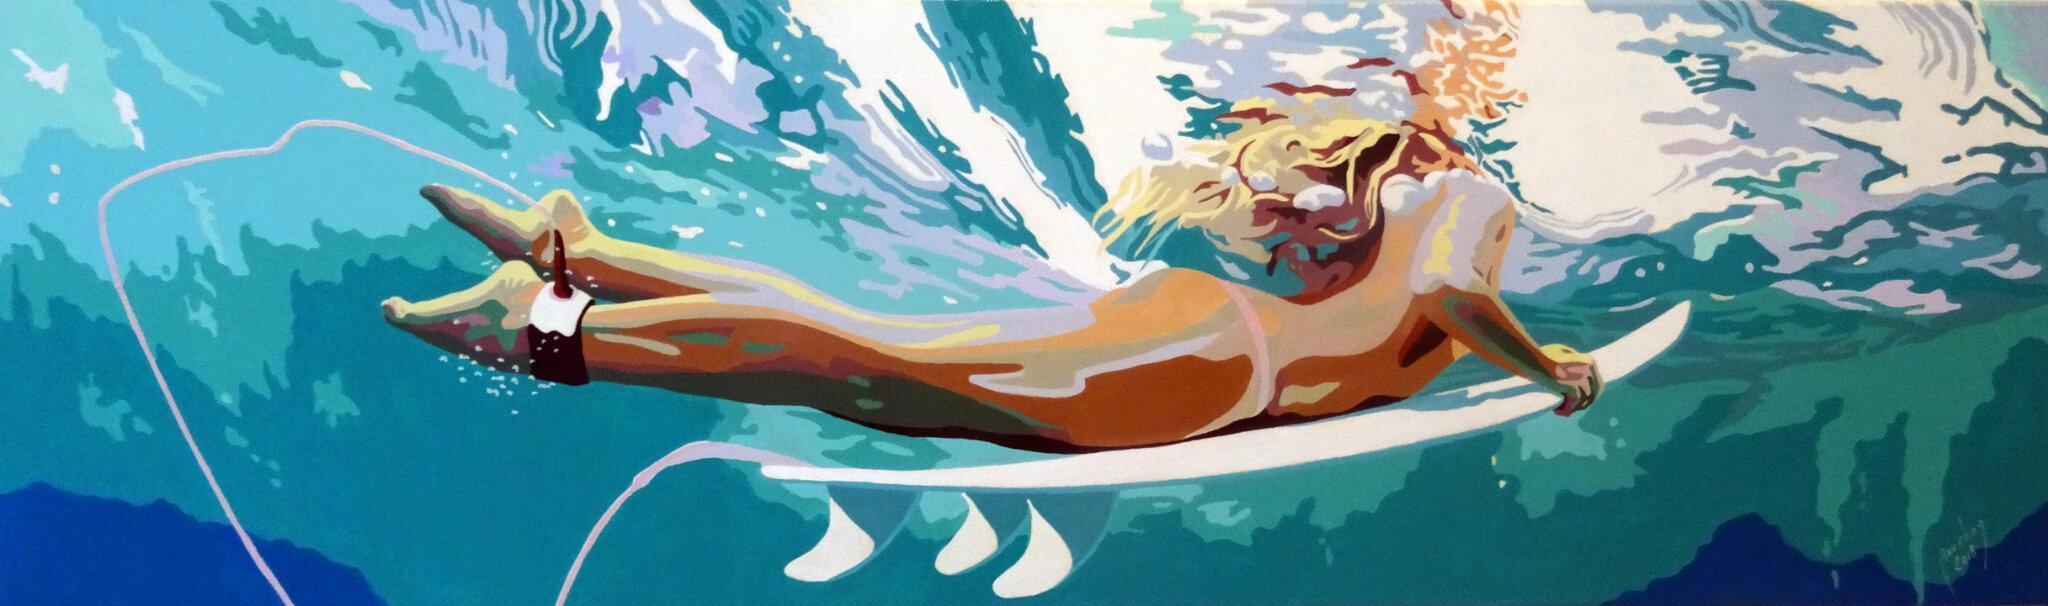 surf (18)